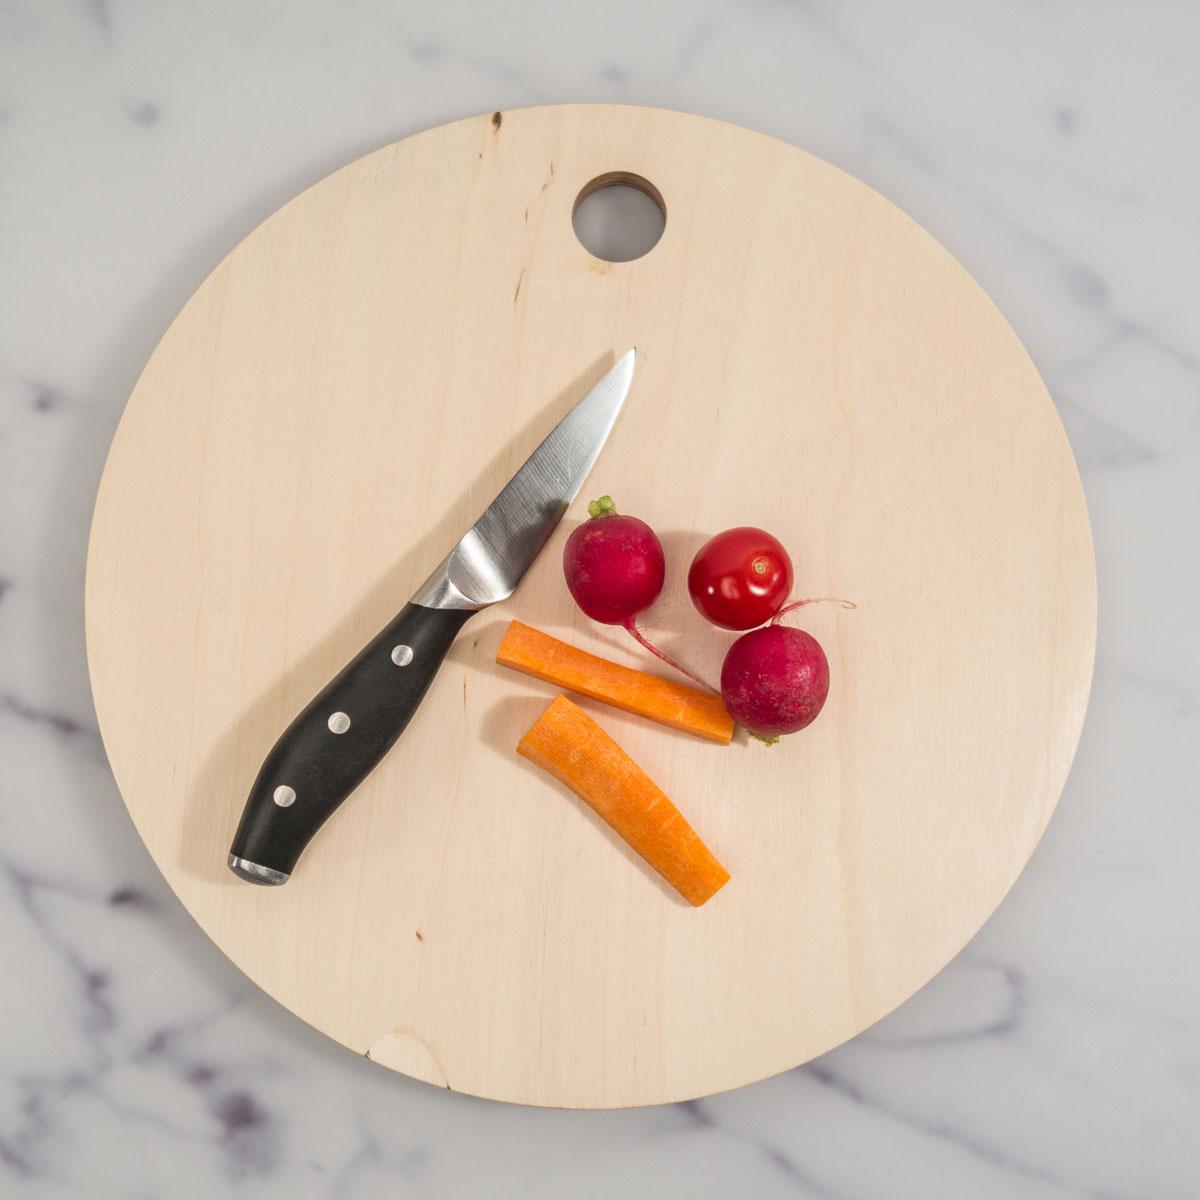 Ronde personaliseerbare snijplank met foto en tekst